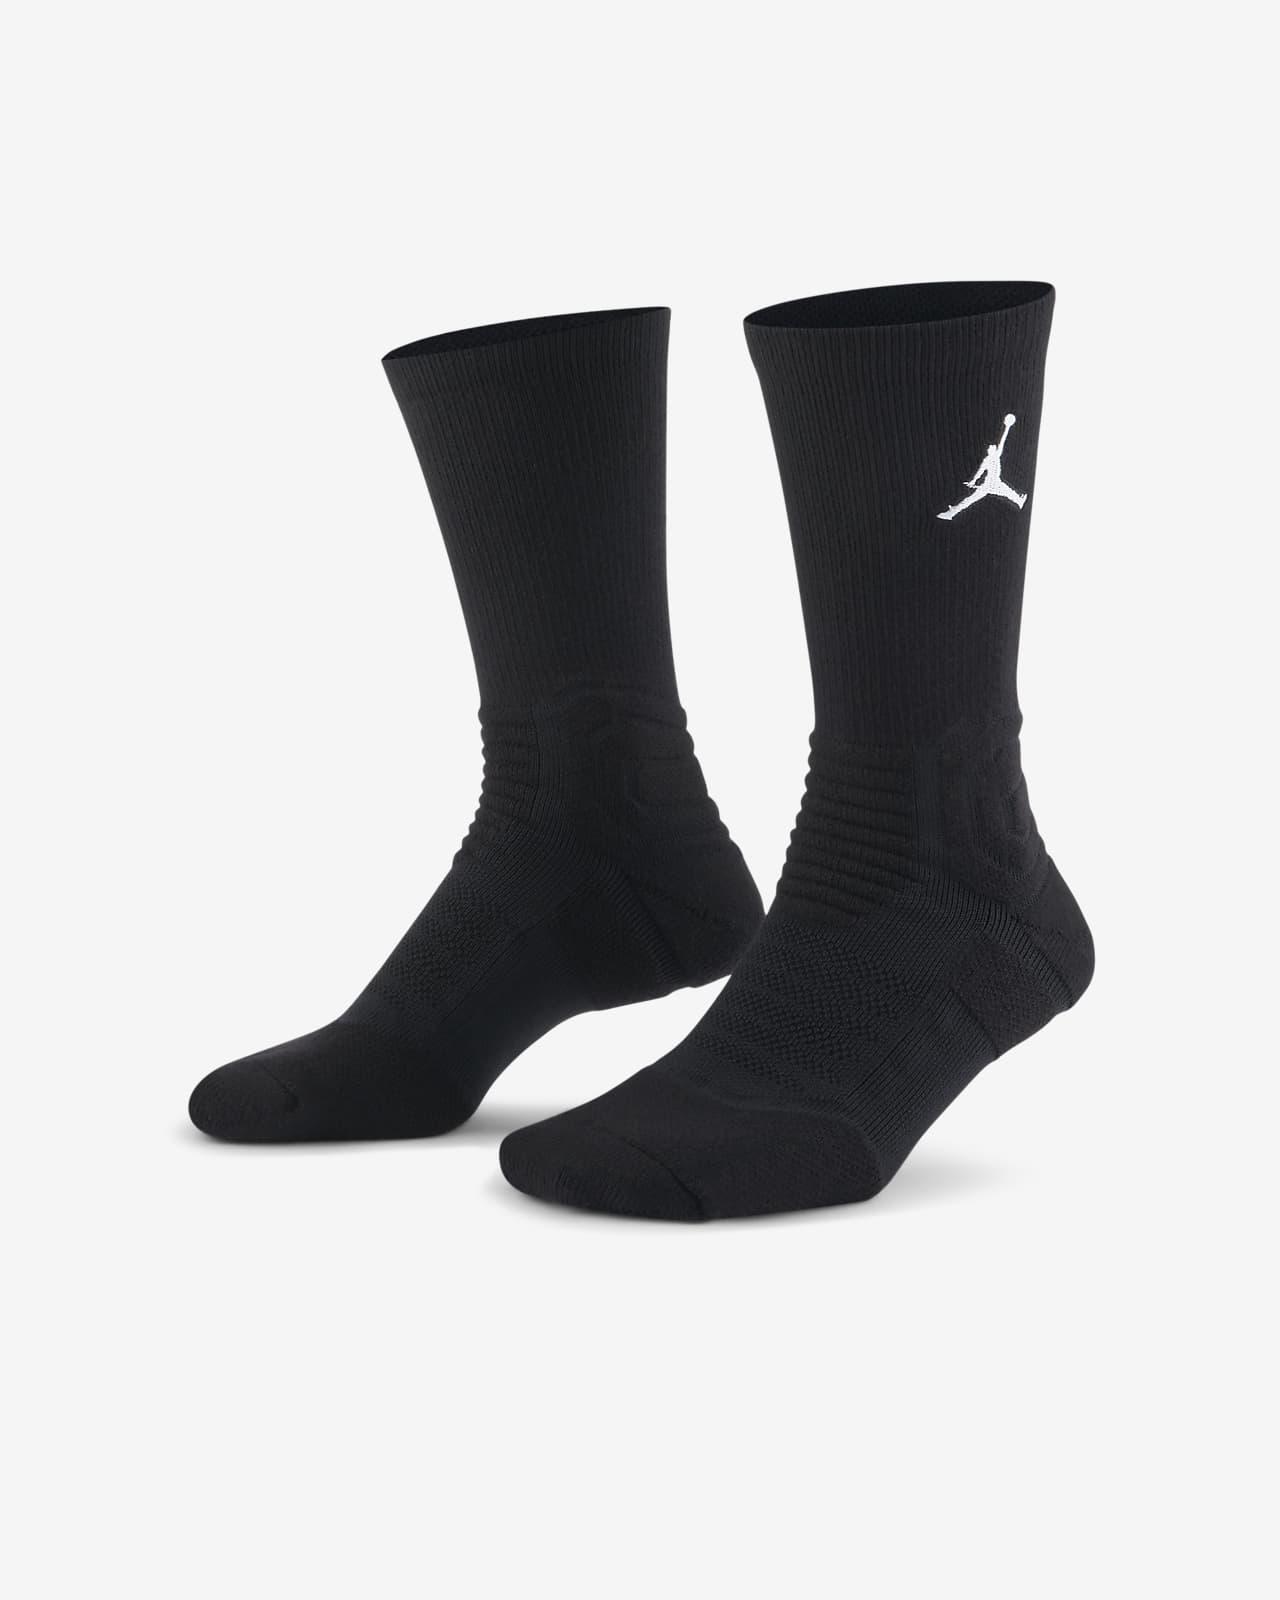 Jordan Flight Crew 篮球袜(1 双)